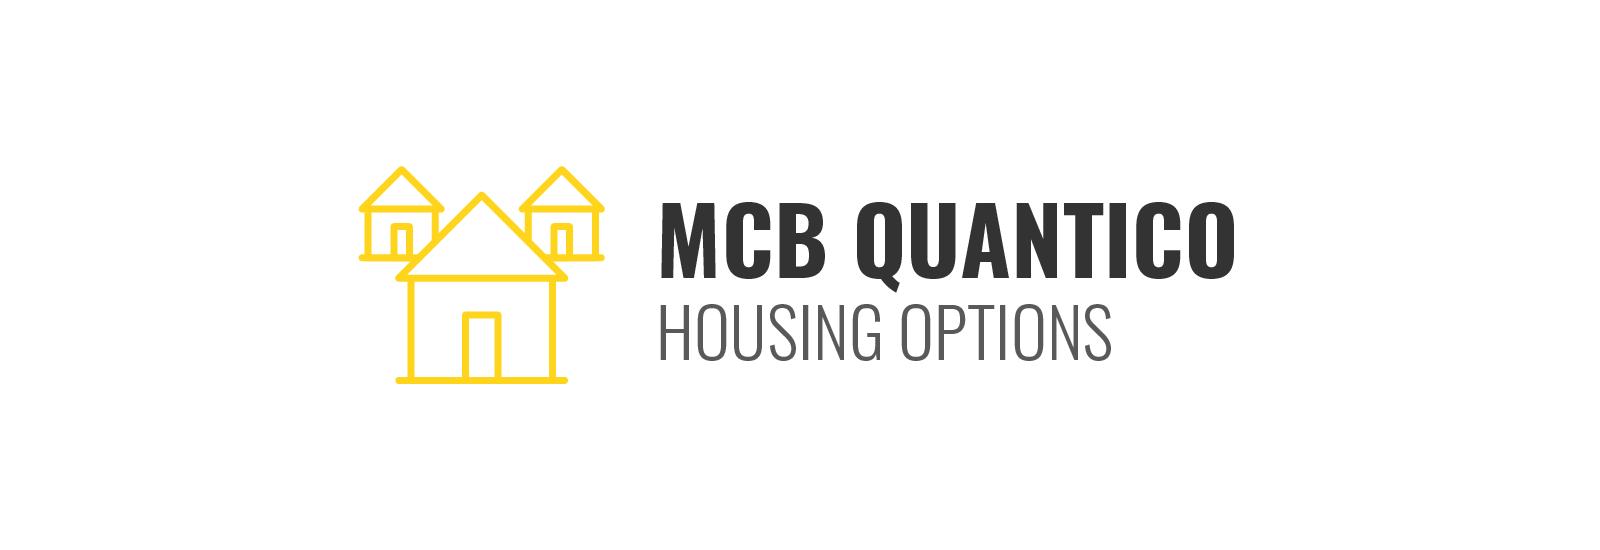 MCB Quantico Housing Options